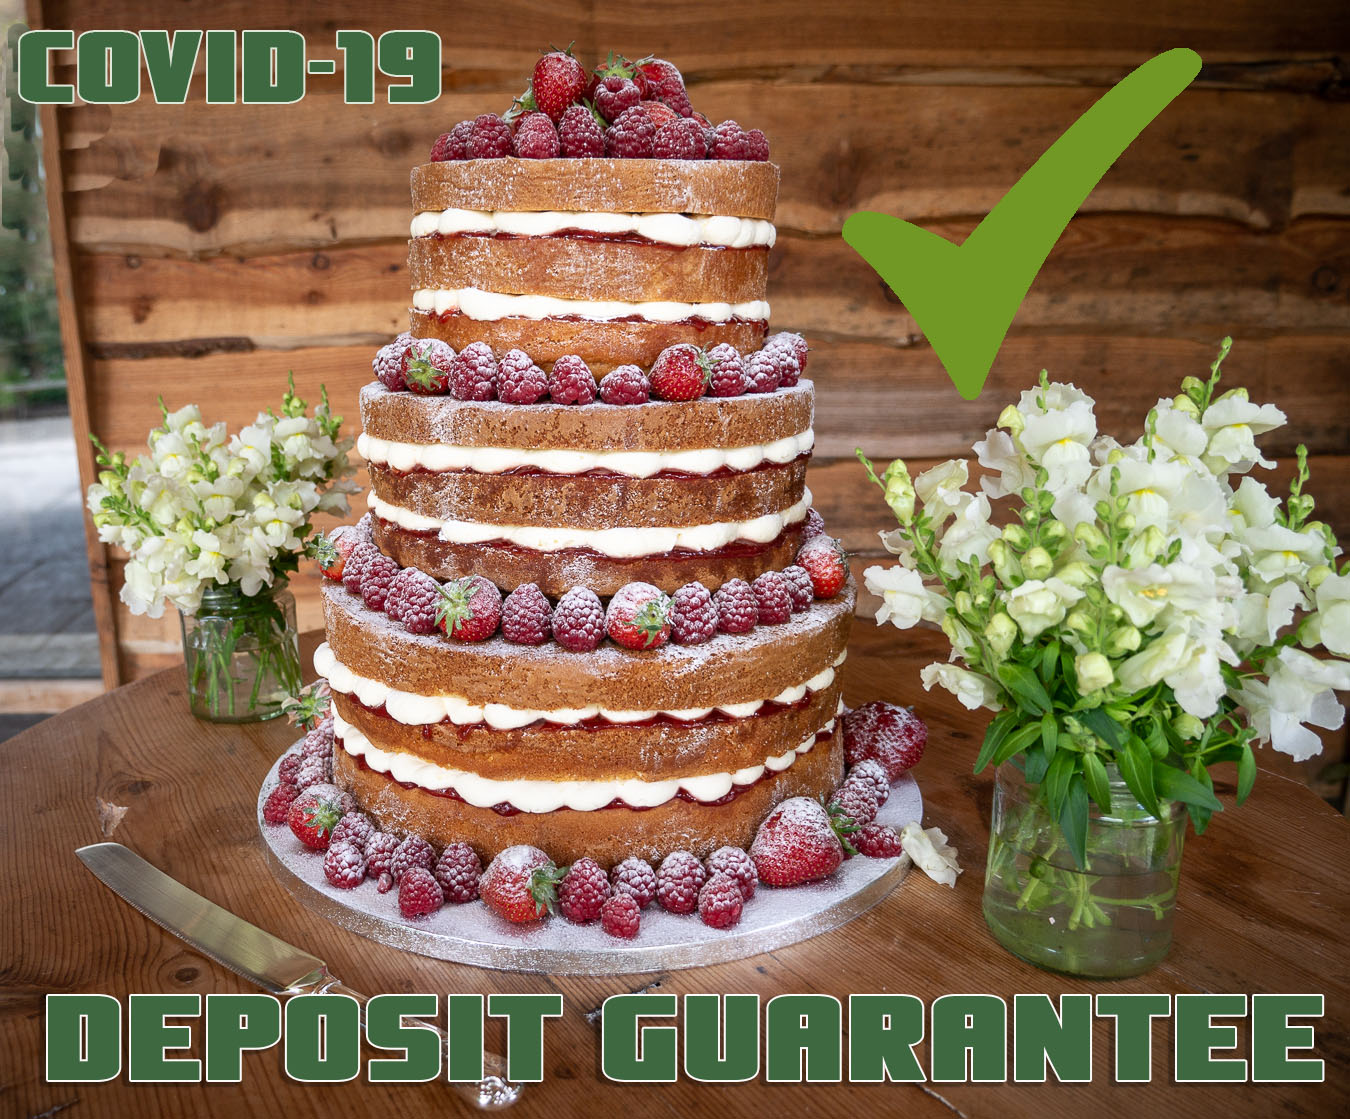 covid-19 wedding cake deposit guarantee